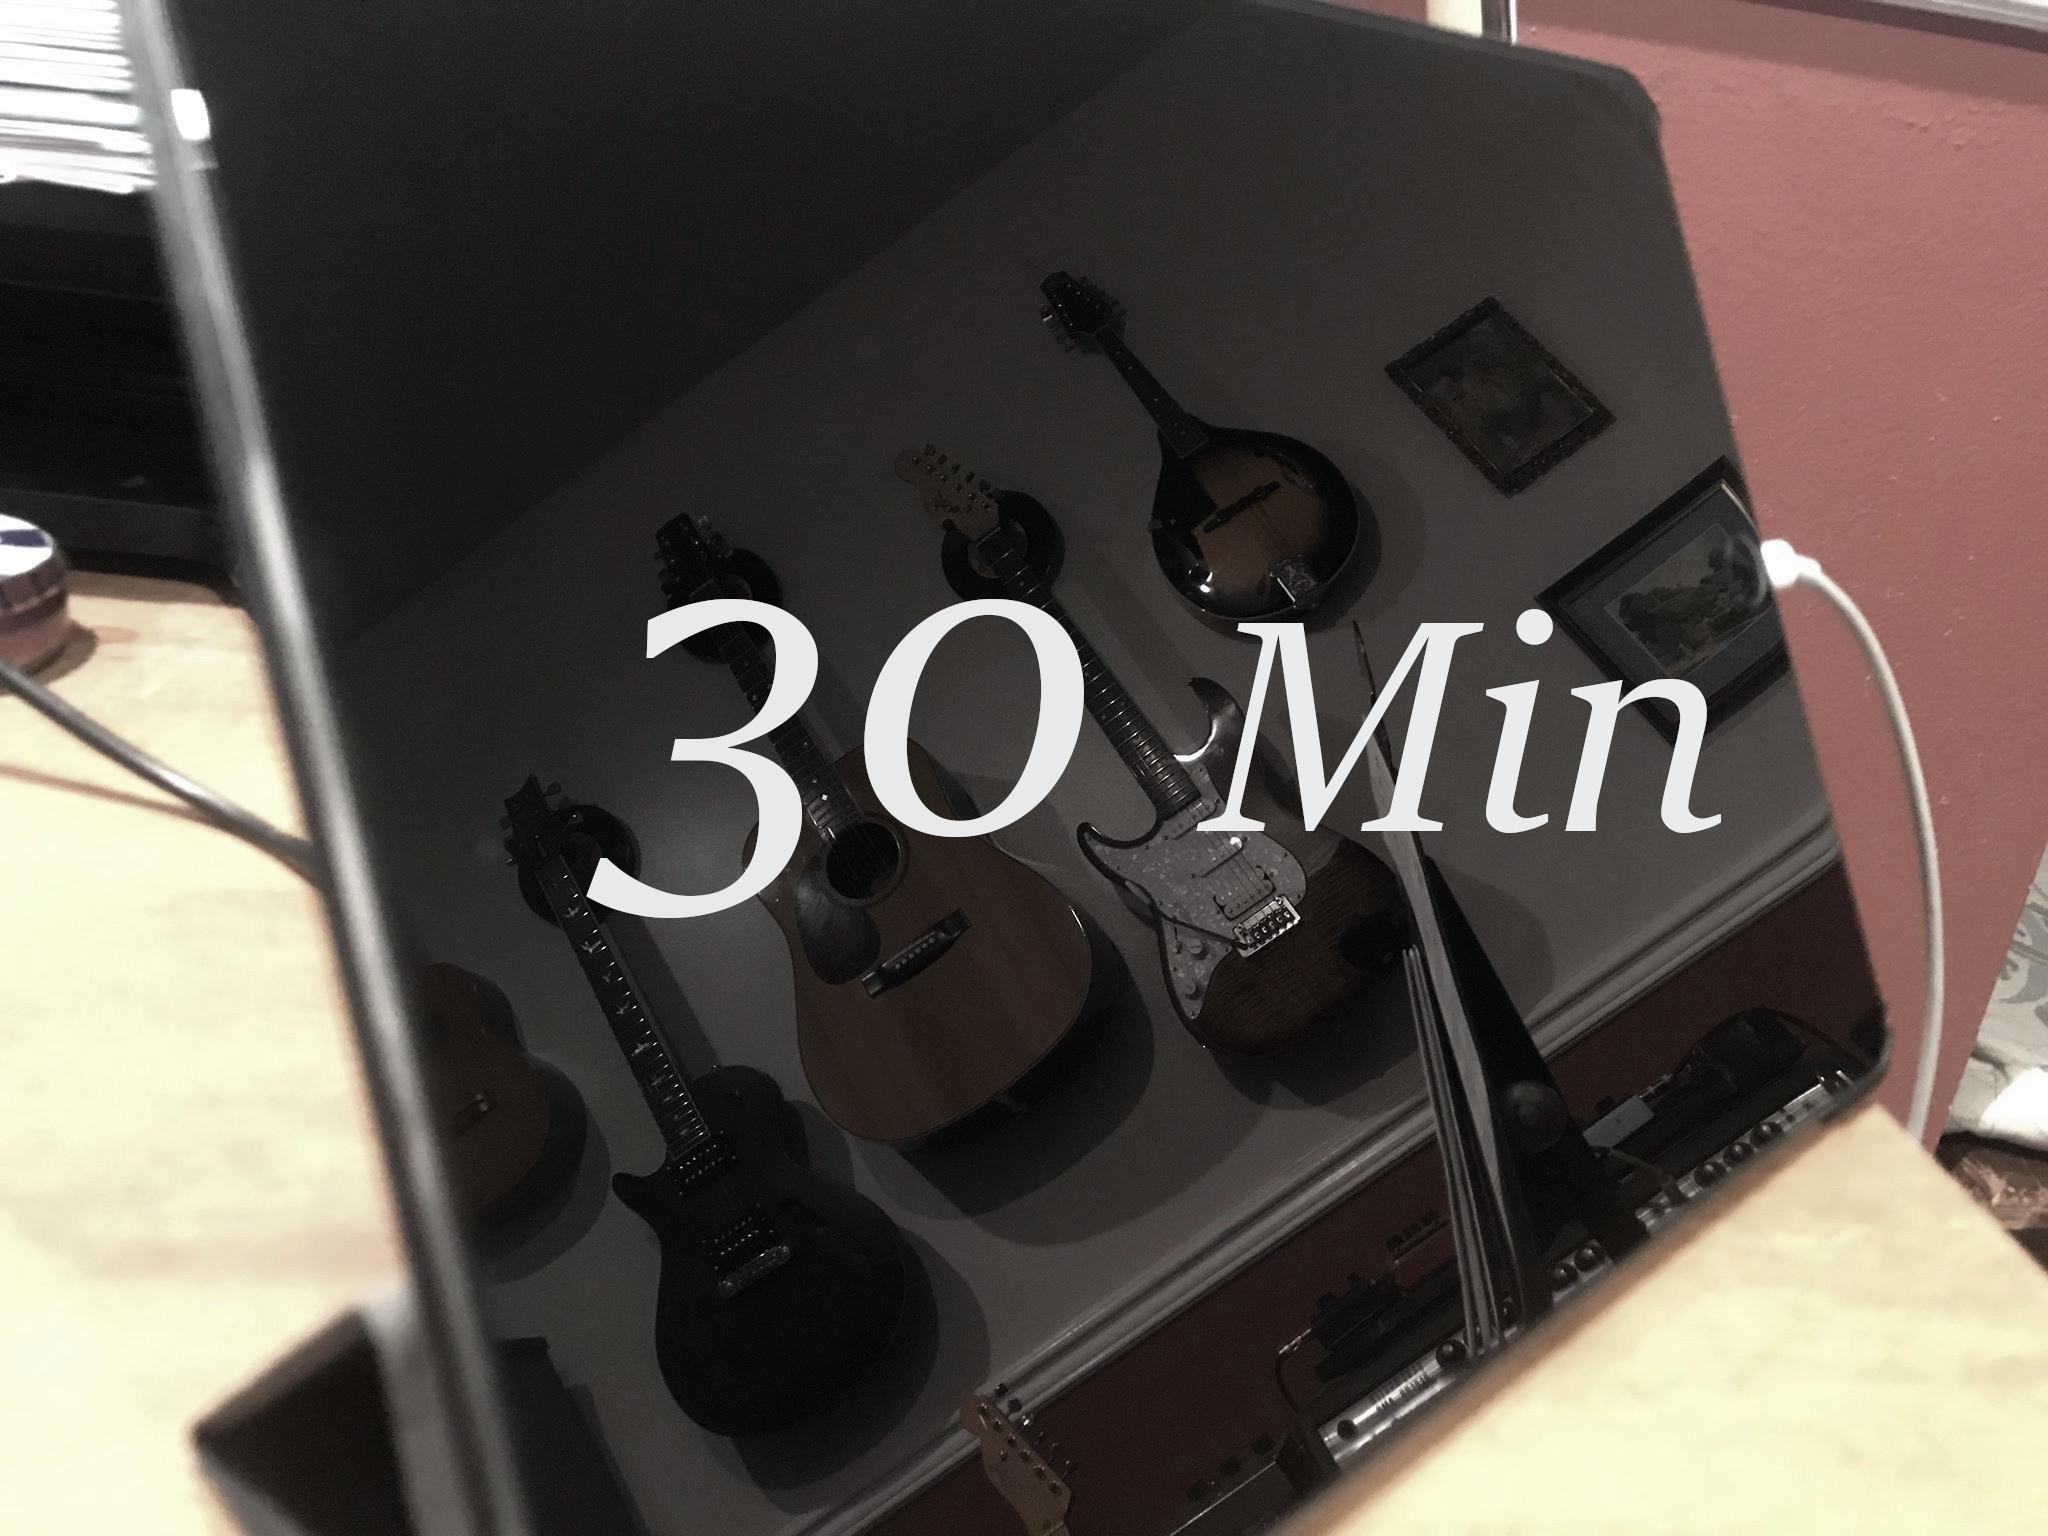 30 Minute Private Online Lesson